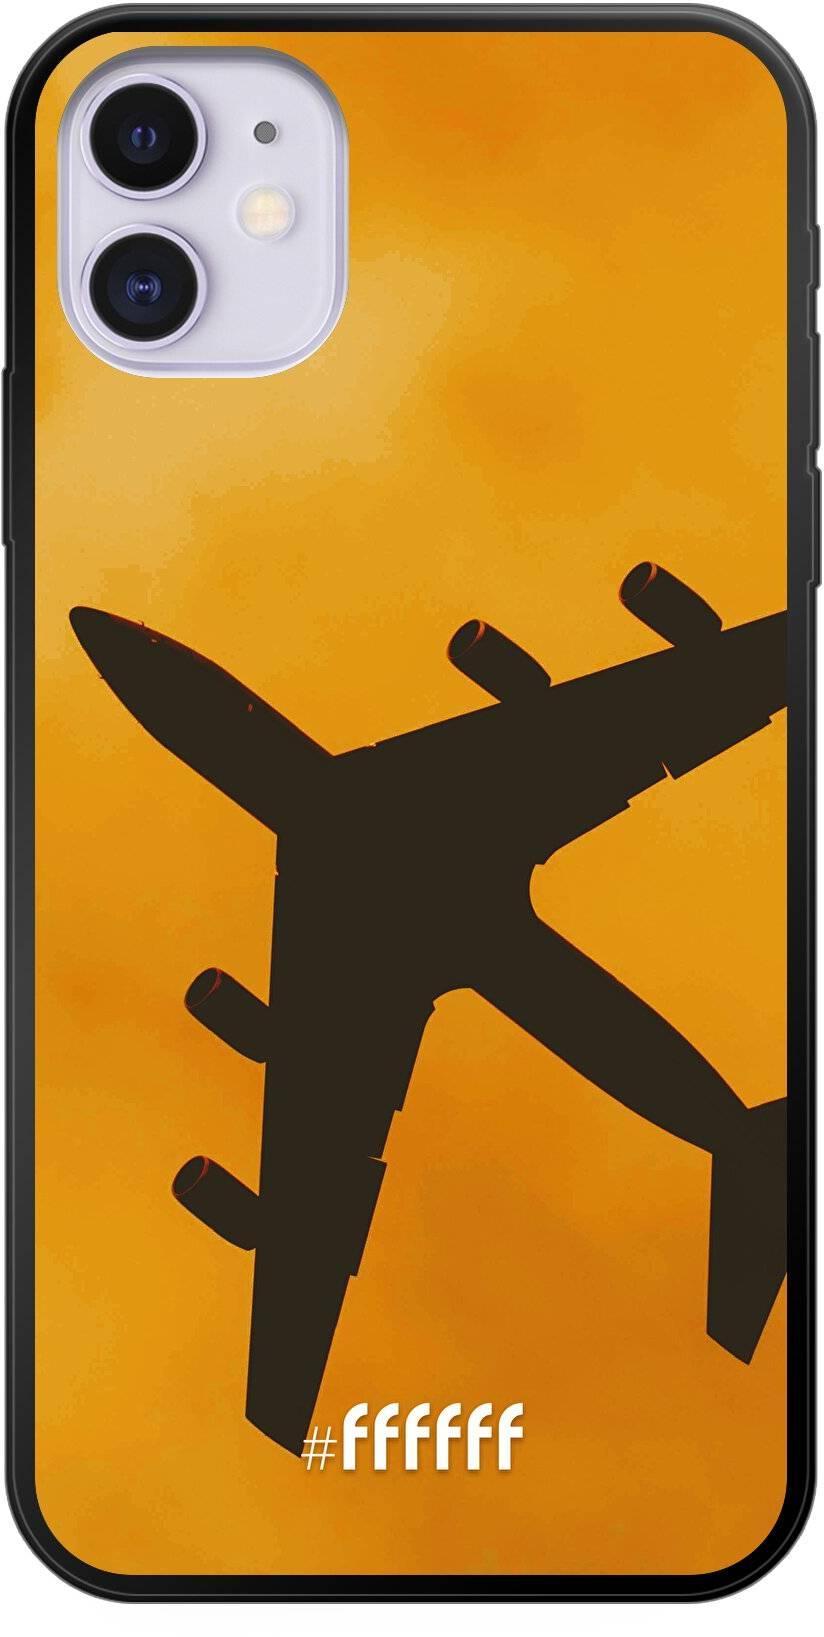 Aeroplane iPhone 11